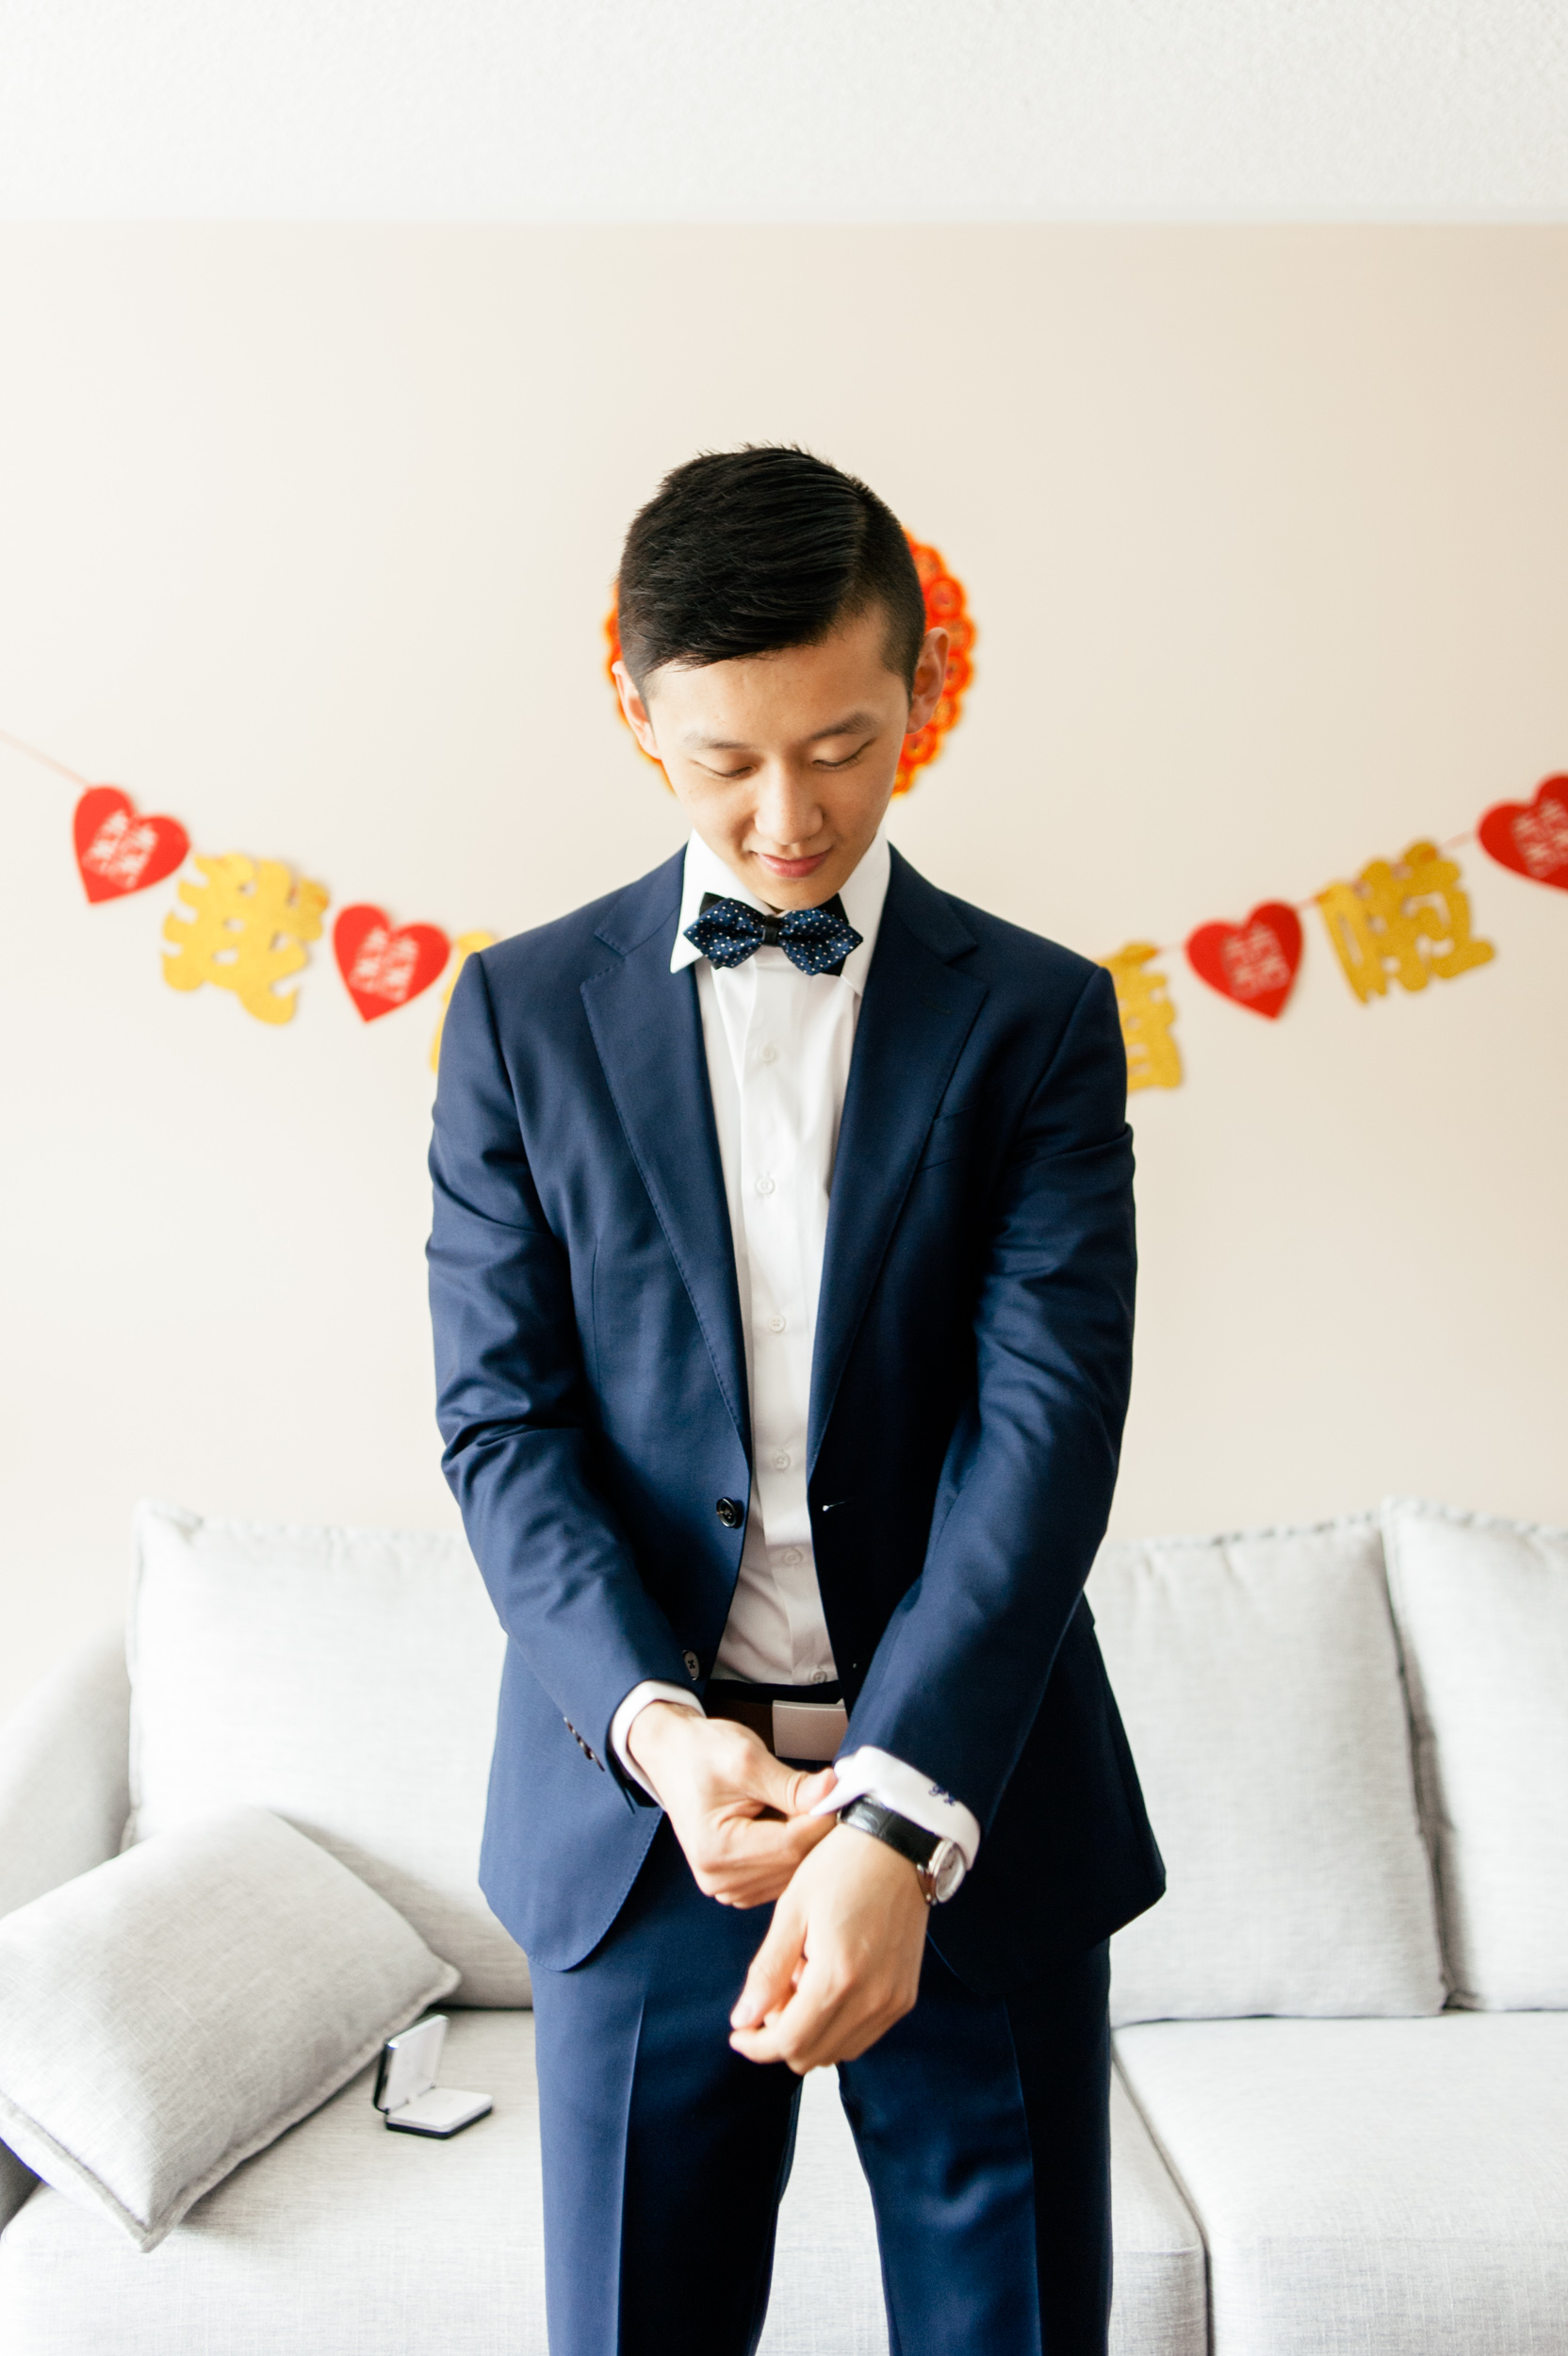 knox-college-wedding-26.jpg